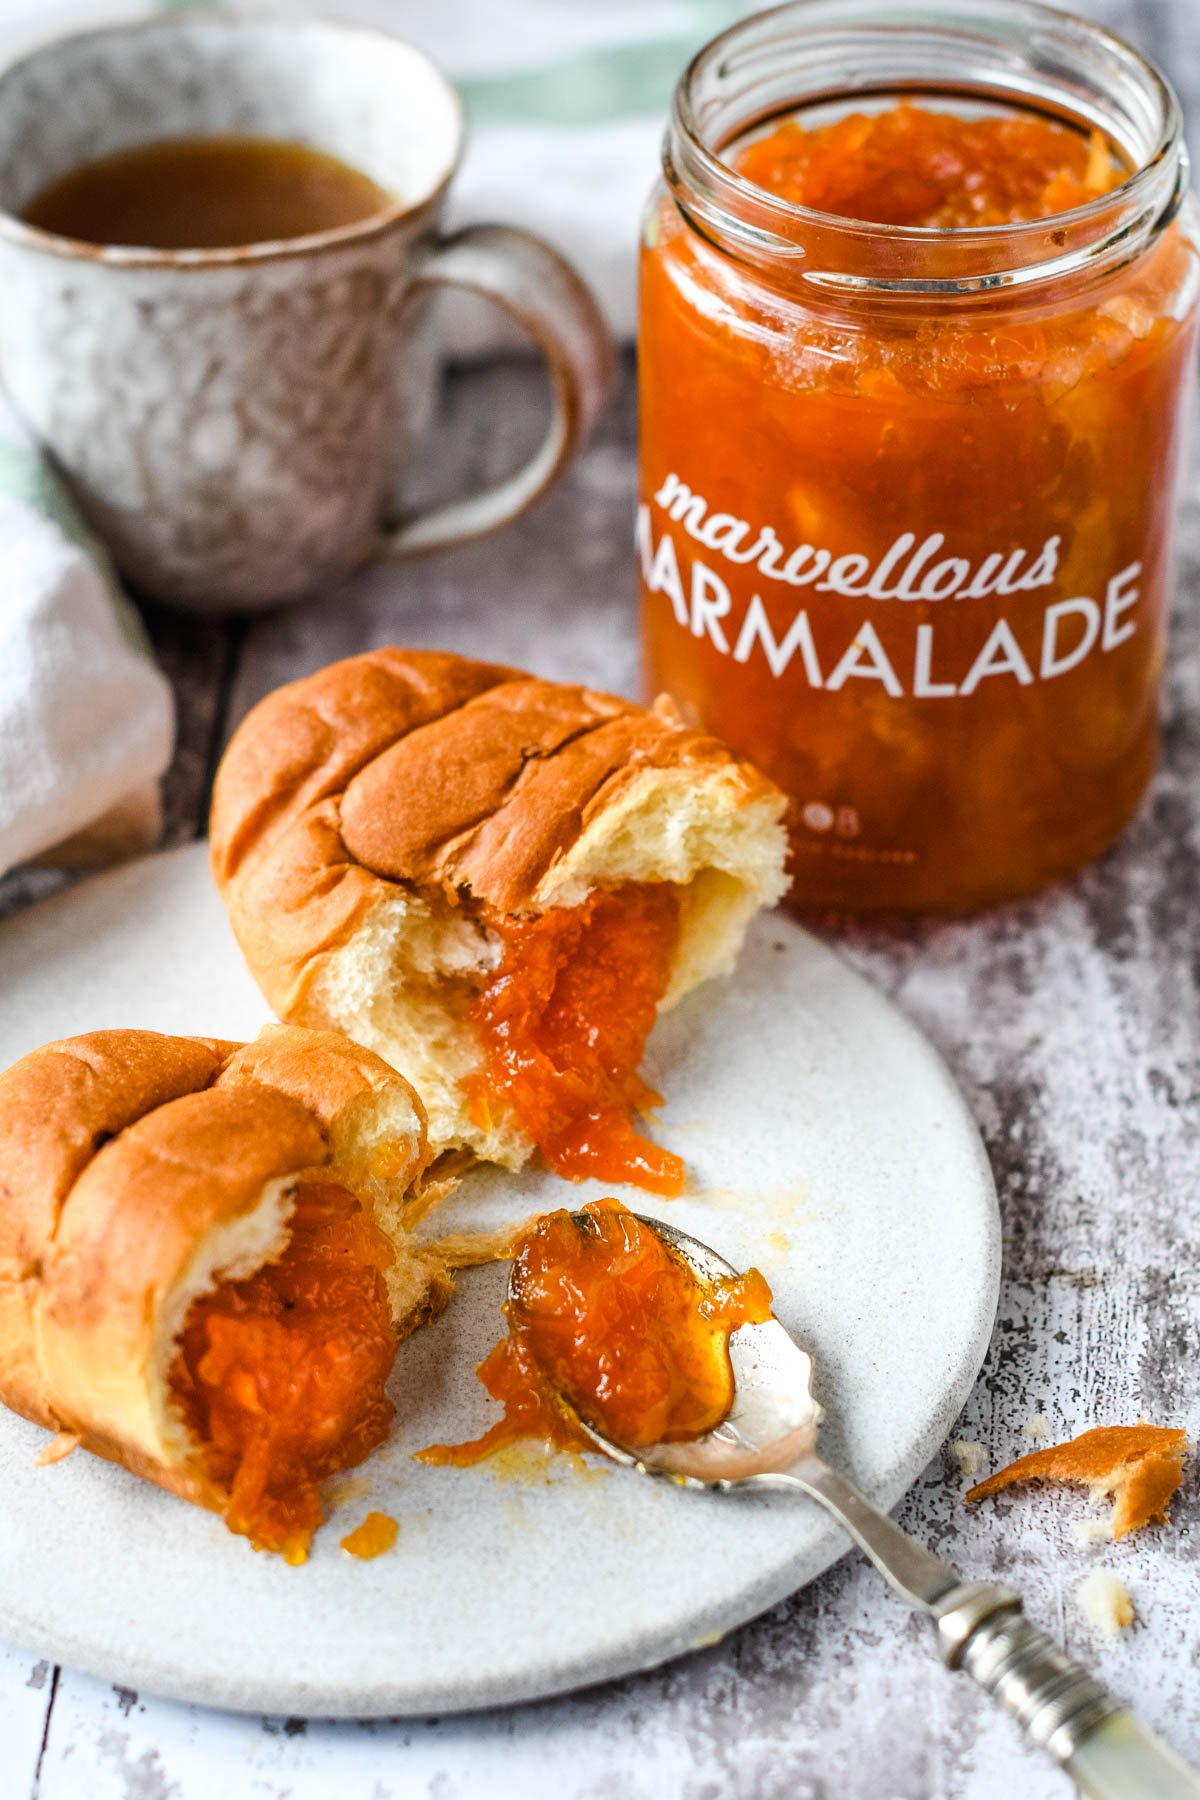 jam on crosissants with jar or marmalade behind